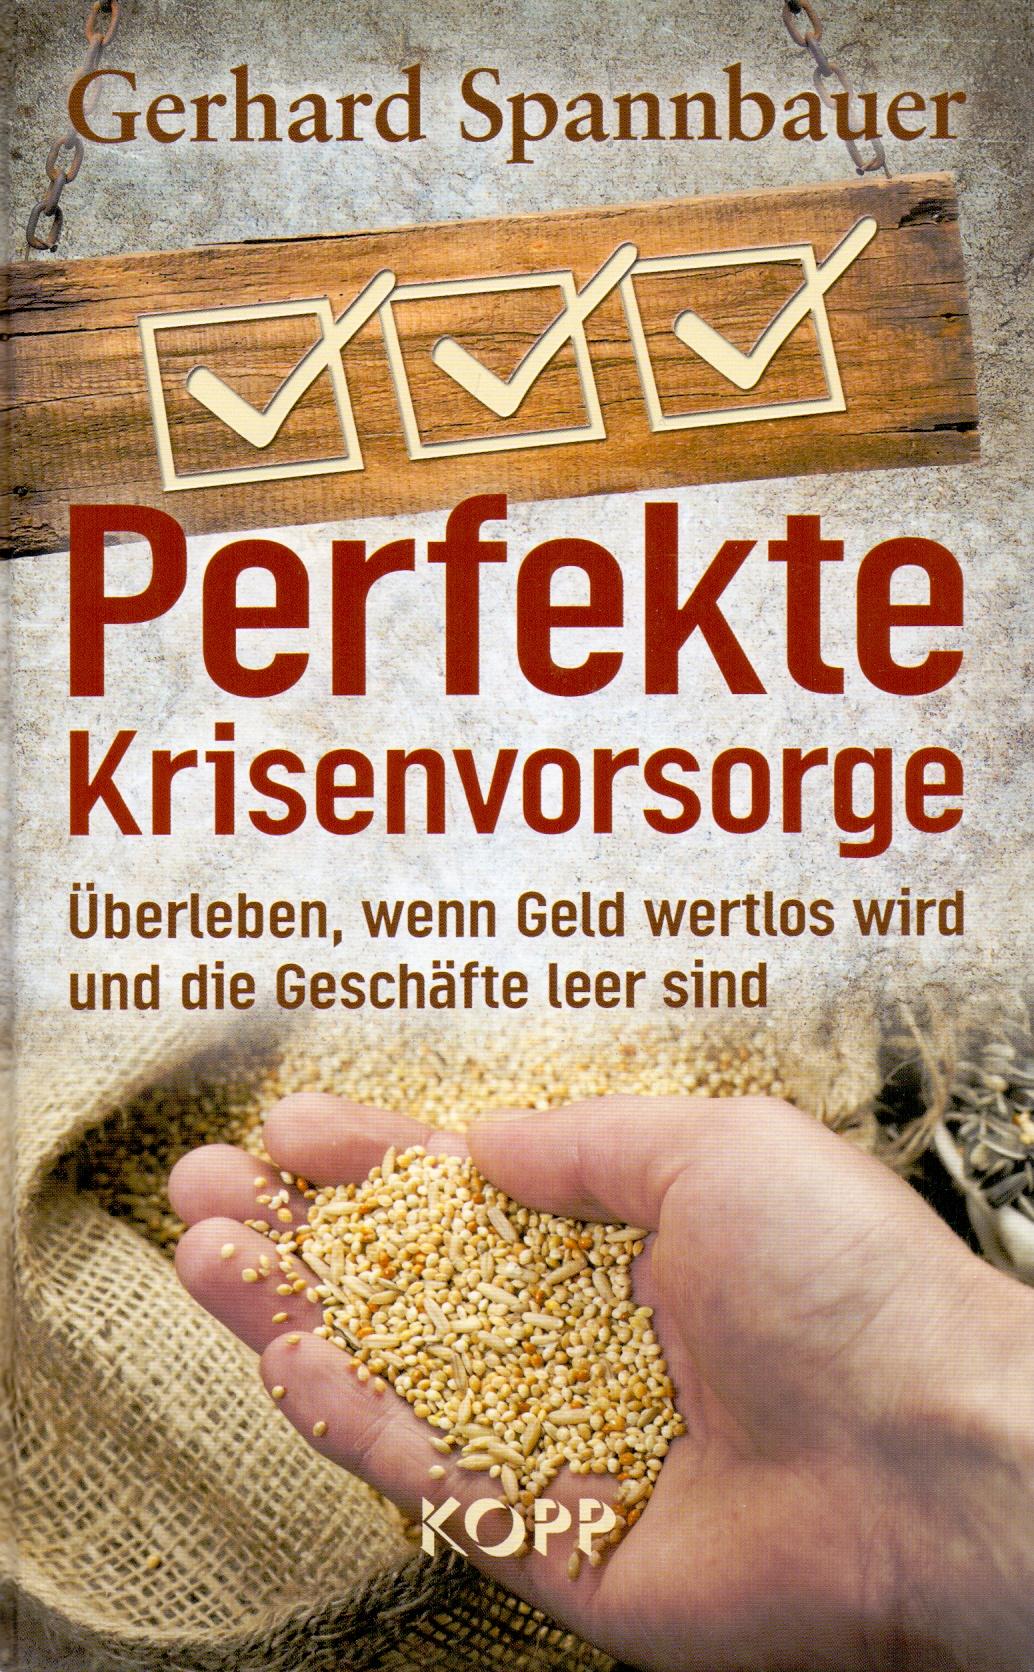 Perfekte Krisenvorsorge - Gerhard Spannbauer [G...